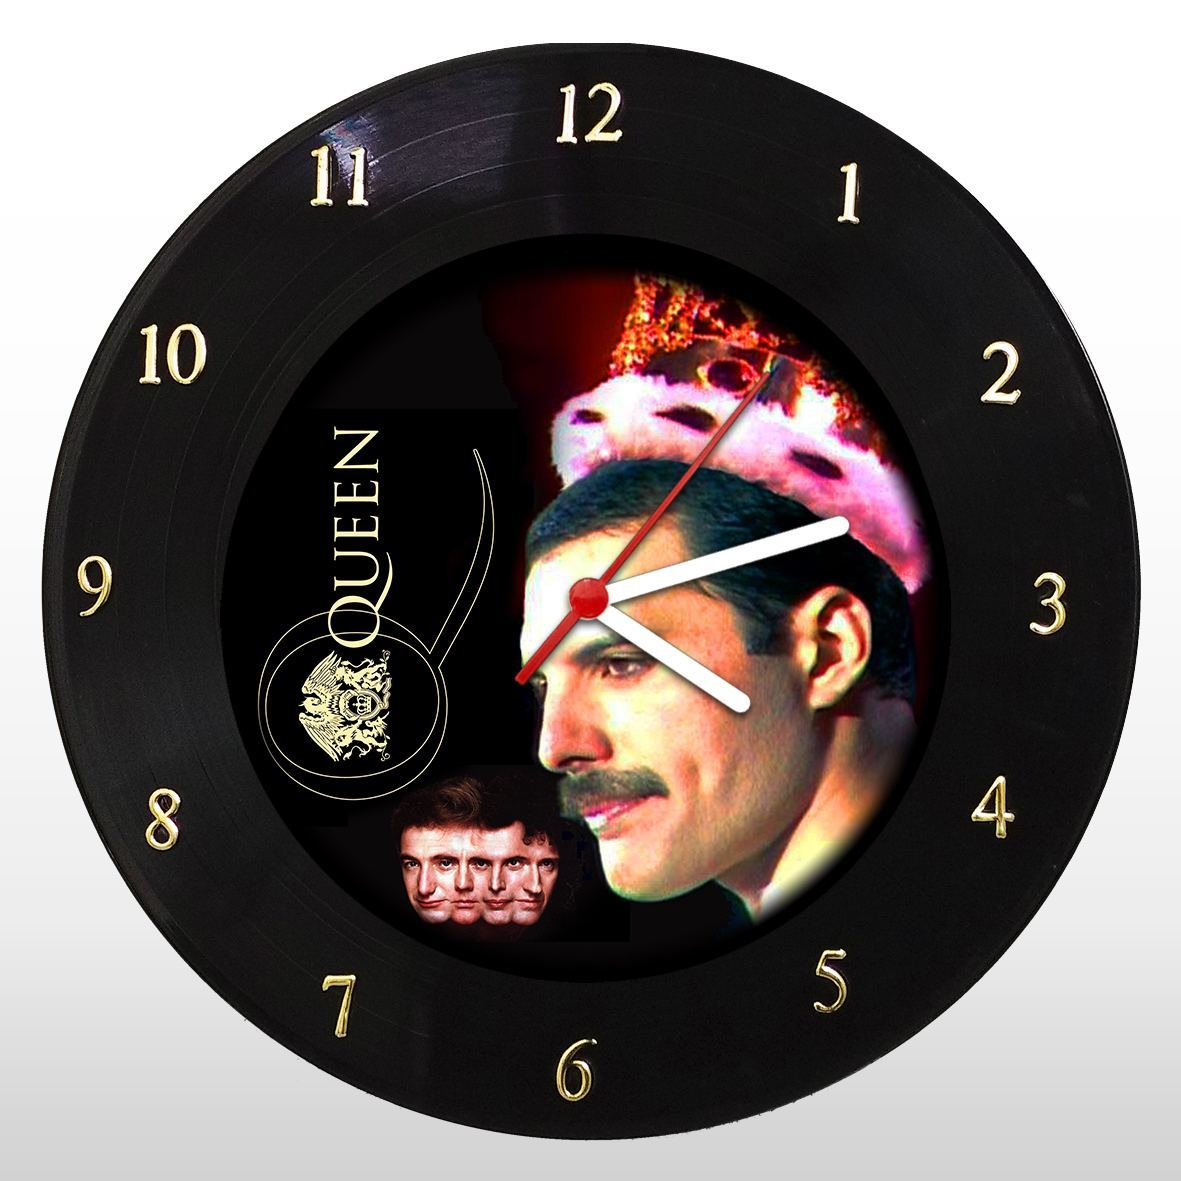 Queen - Relógio de Parede em Disco de Vinil - Mr. Rock